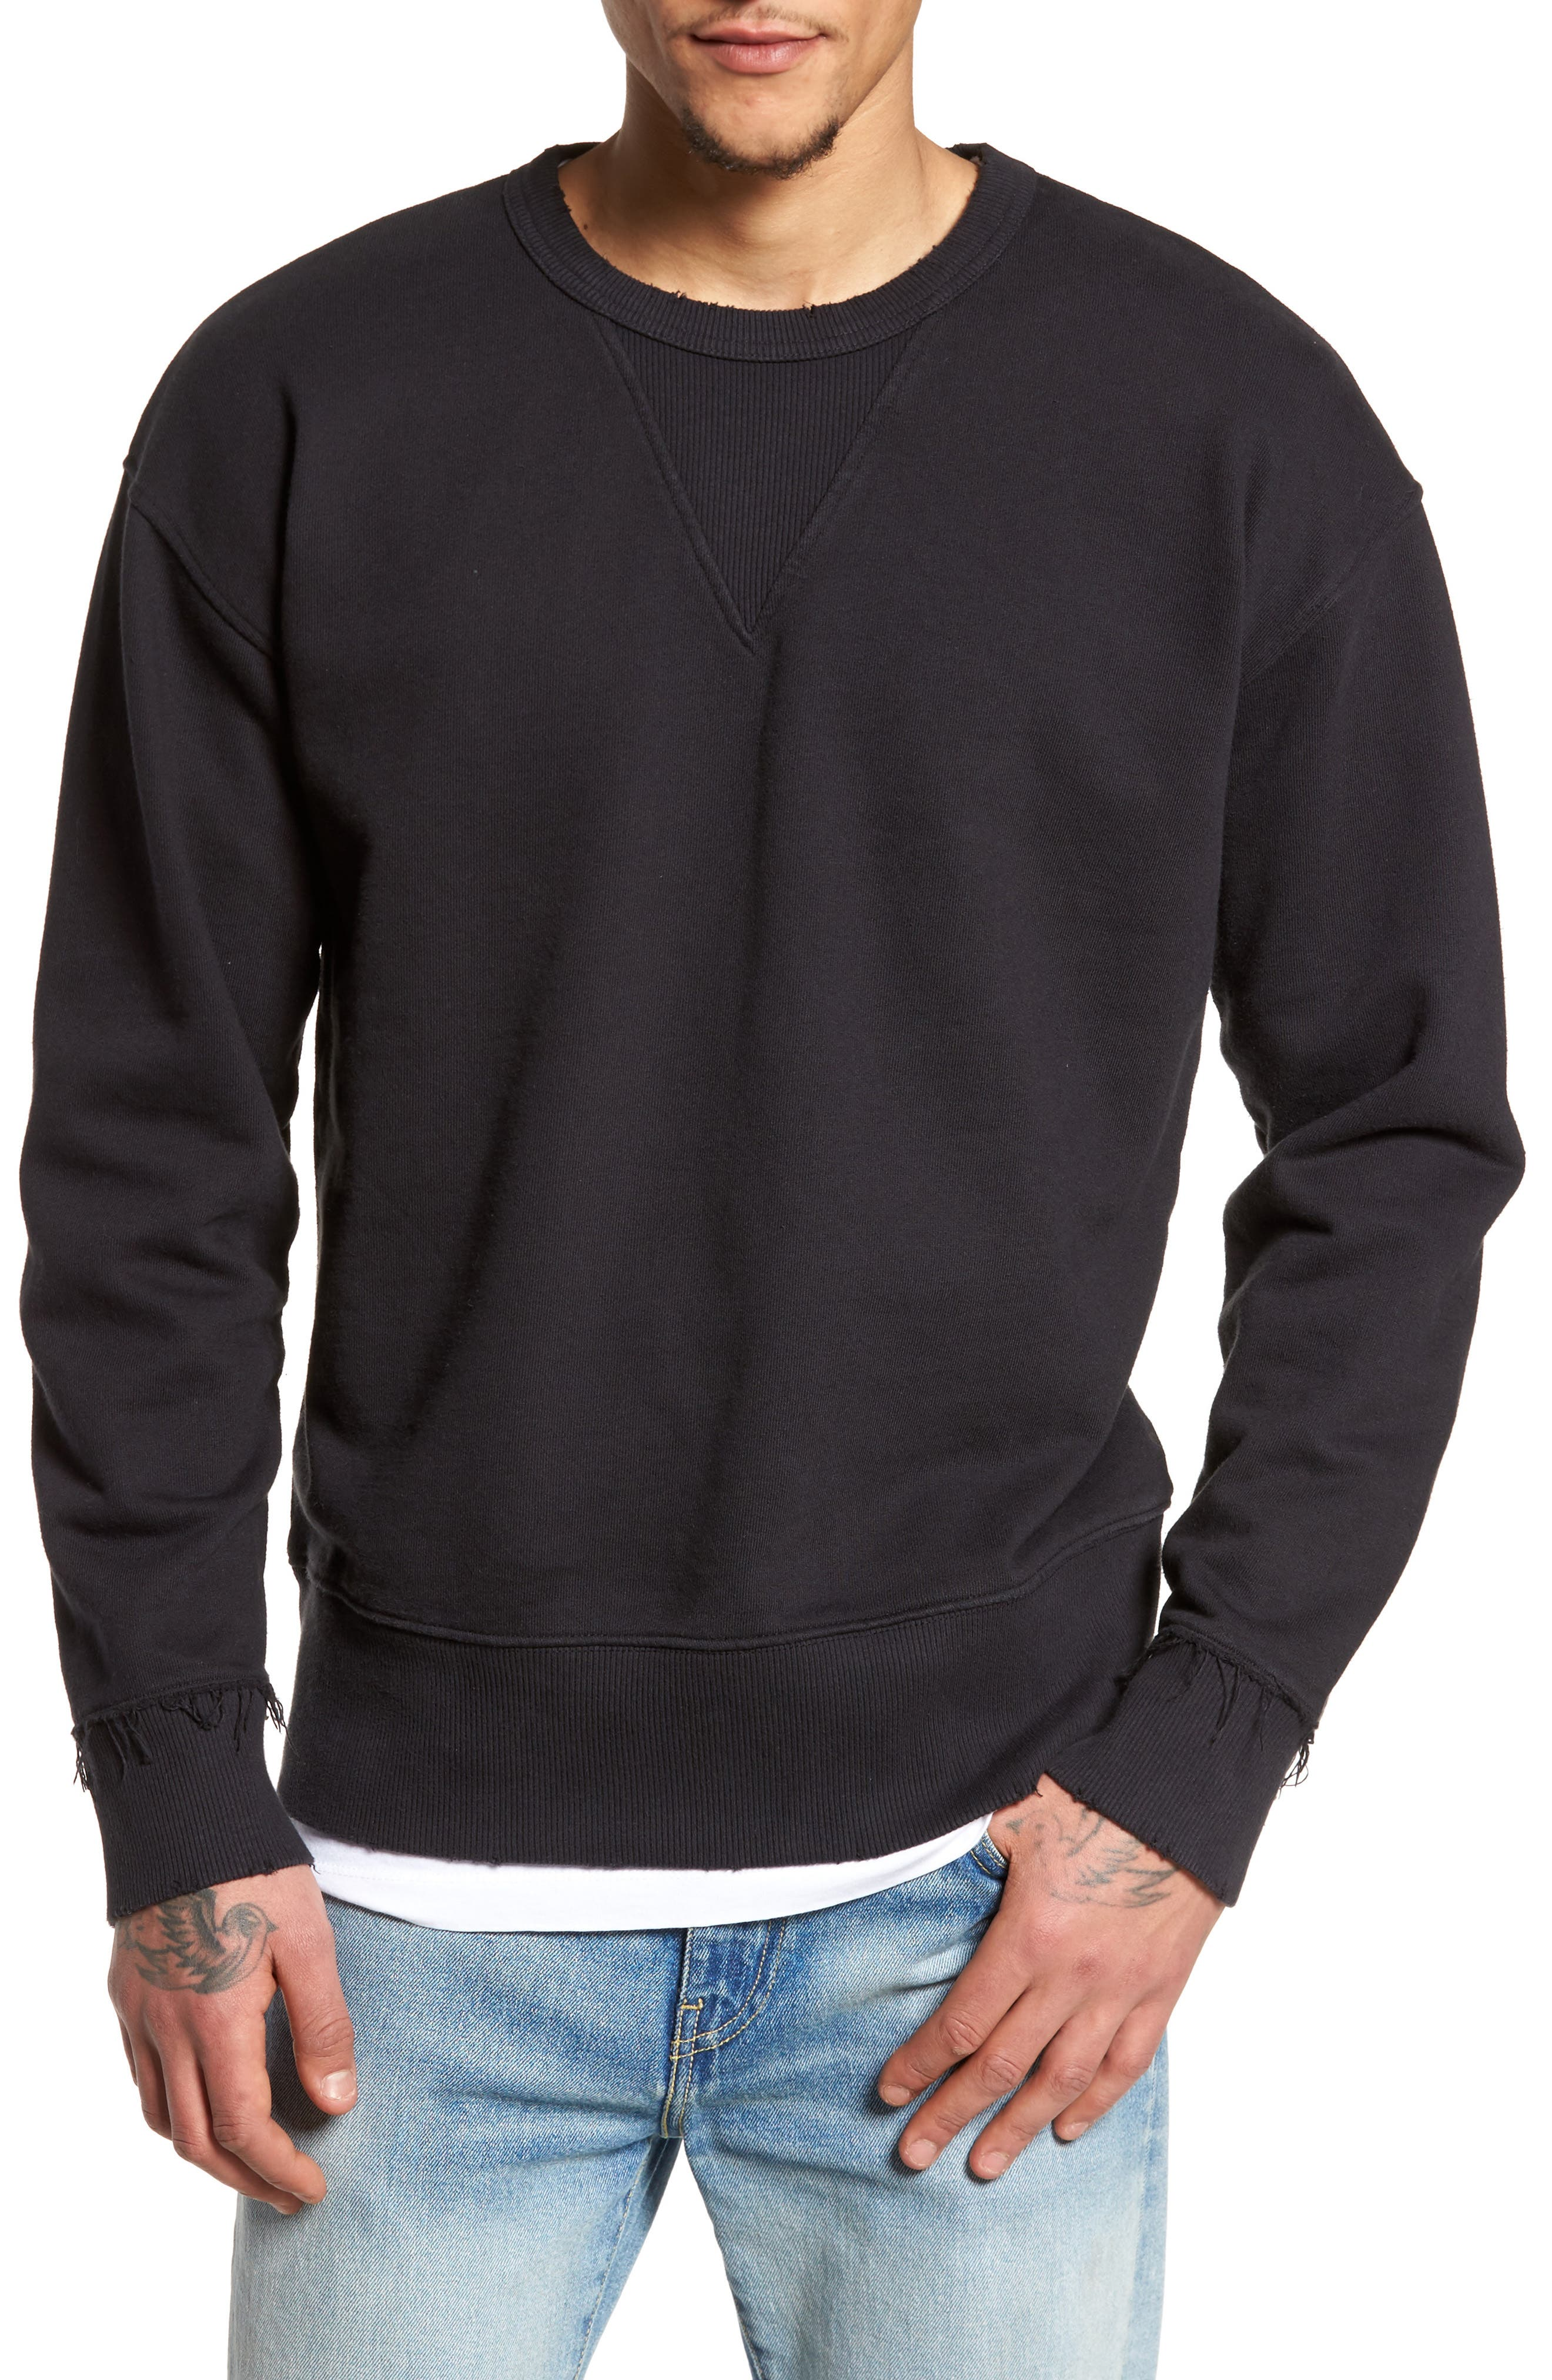 Distressed Sweatshirt,                             Main thumbnail 1, color,                             001